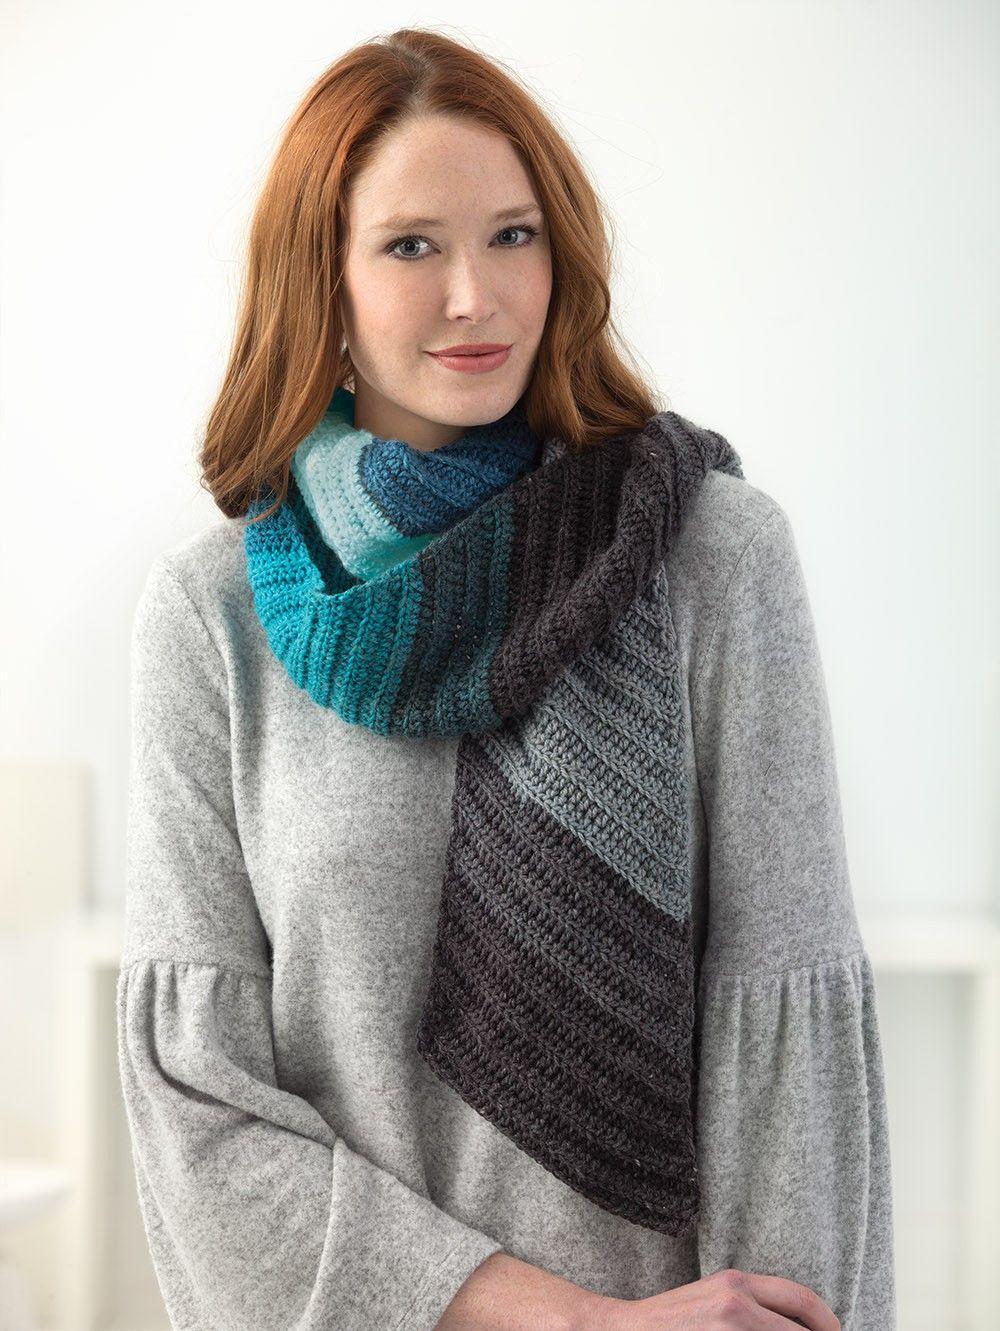 Shaded Diagonal Scarf Crochet Out Of Stock Eta January 2018